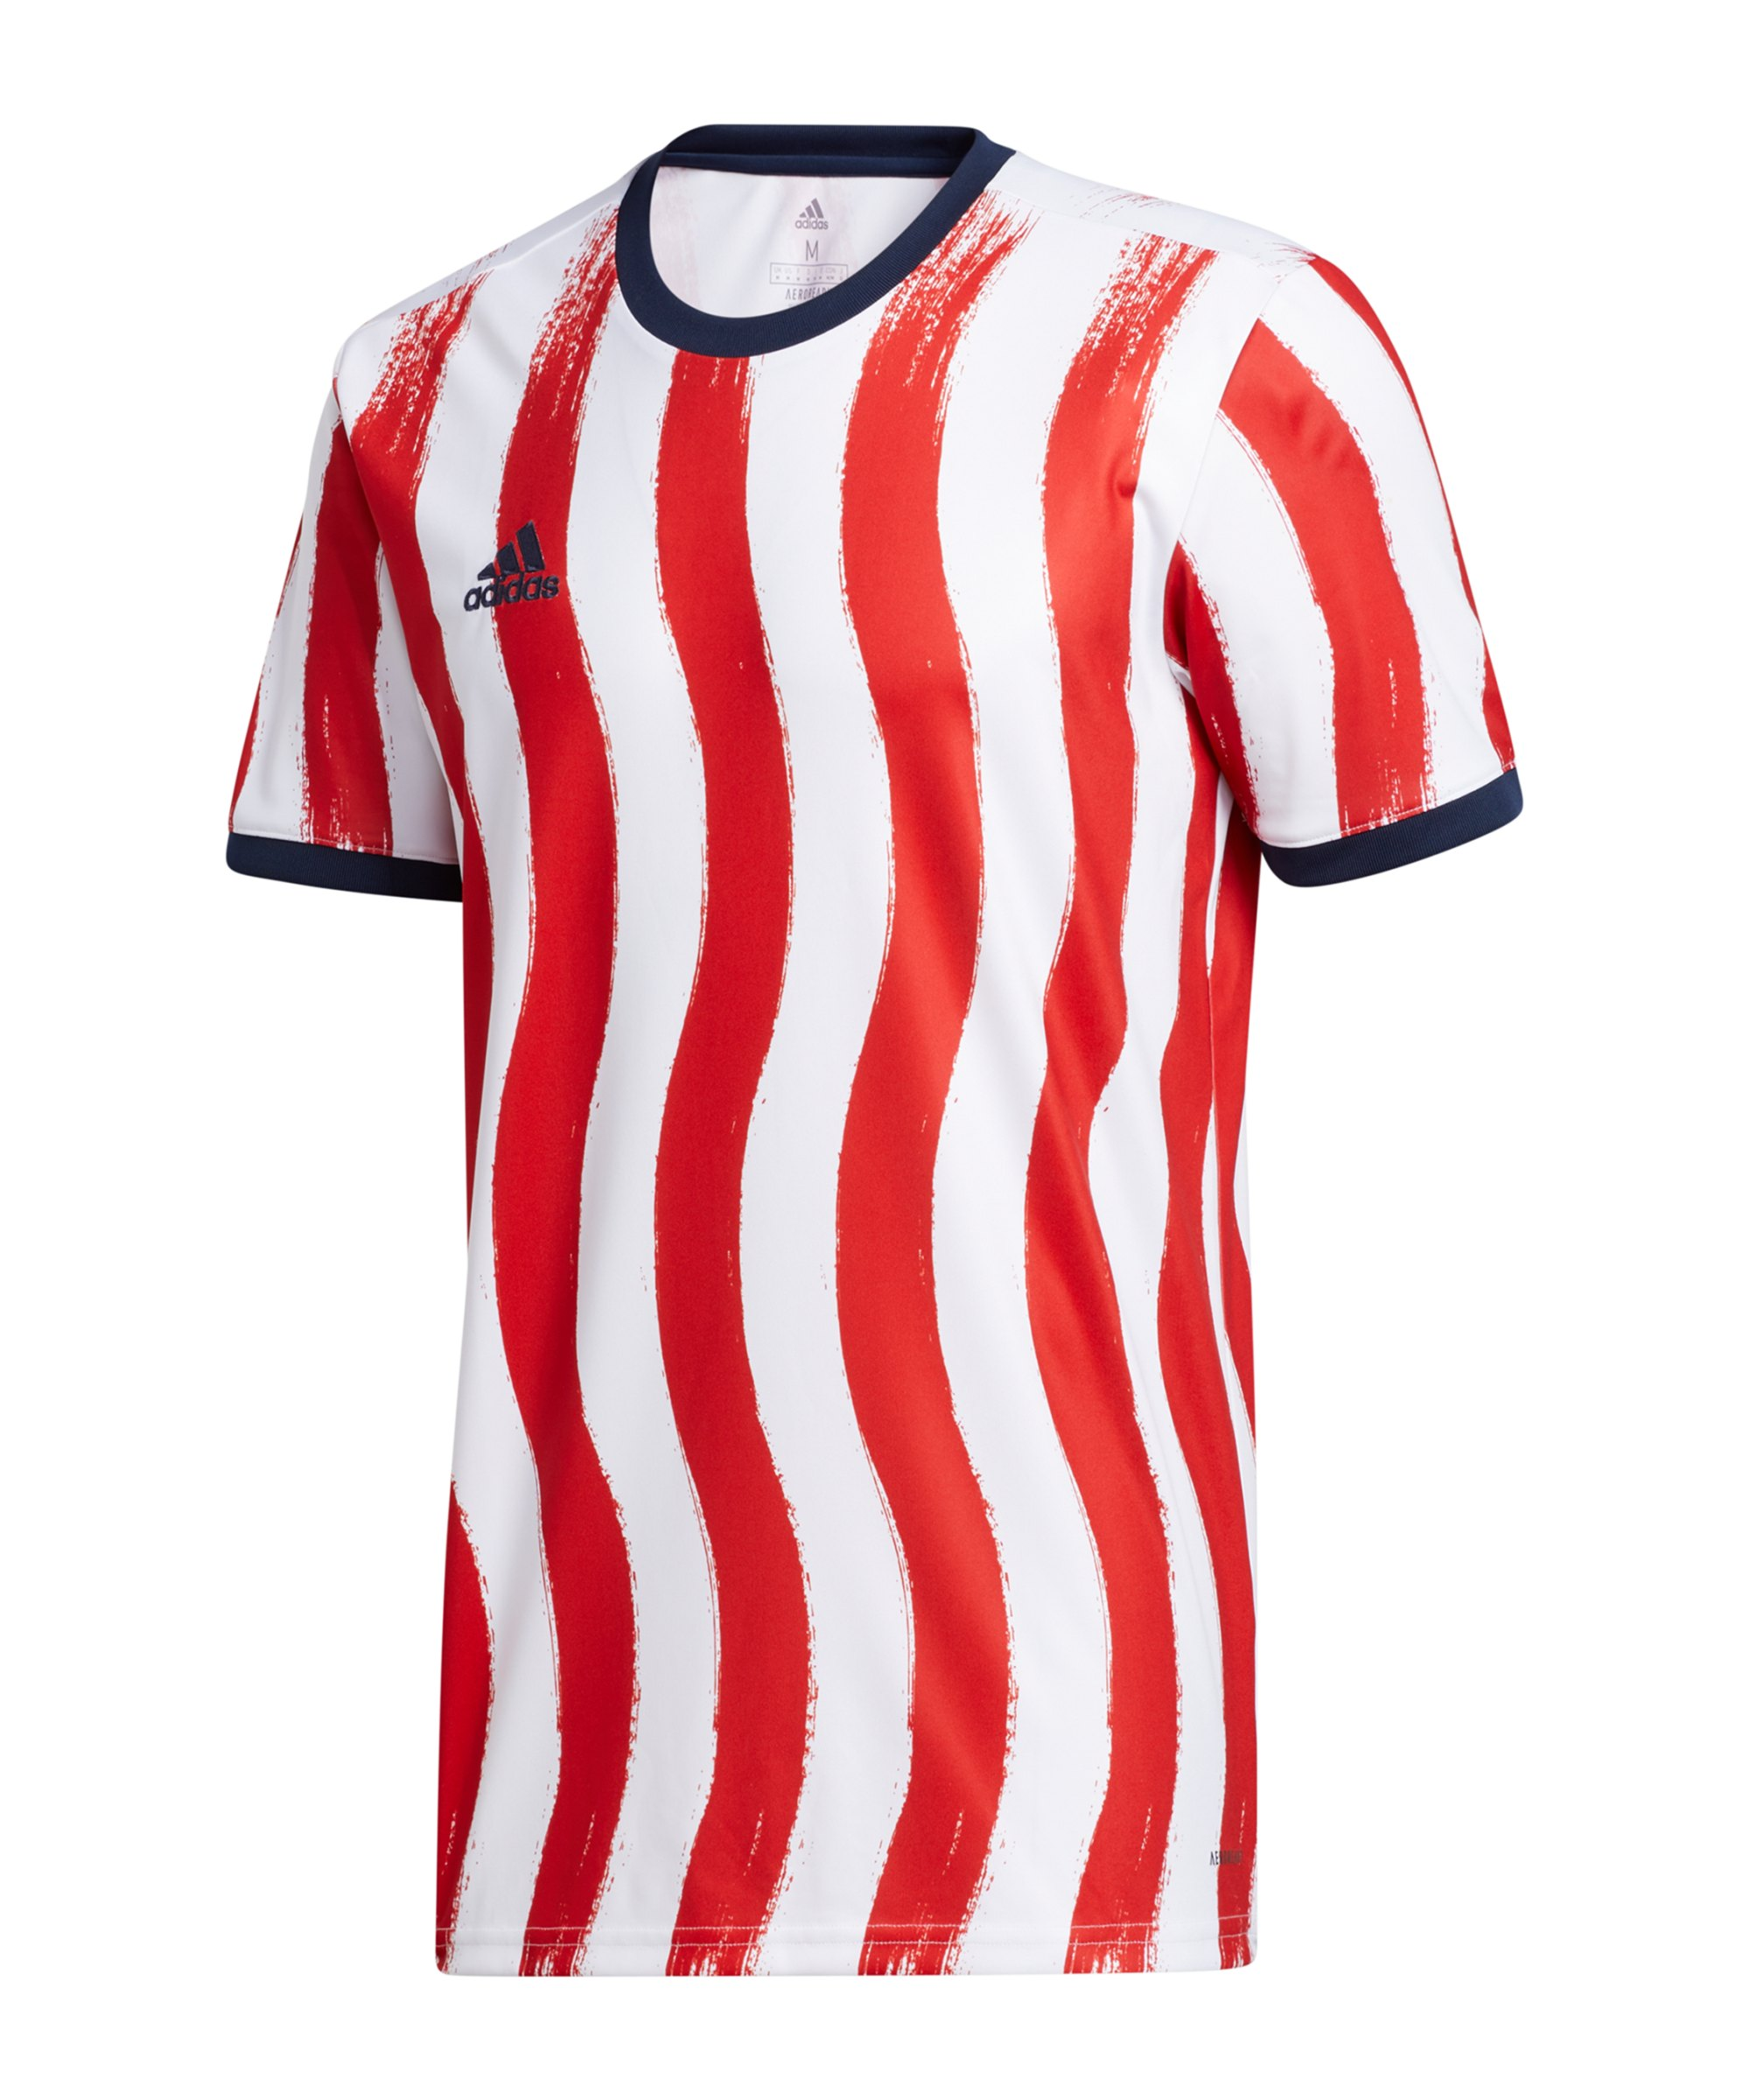 adidas MLS All Star Prematch Shirt 2021/2022 Weiss - rot